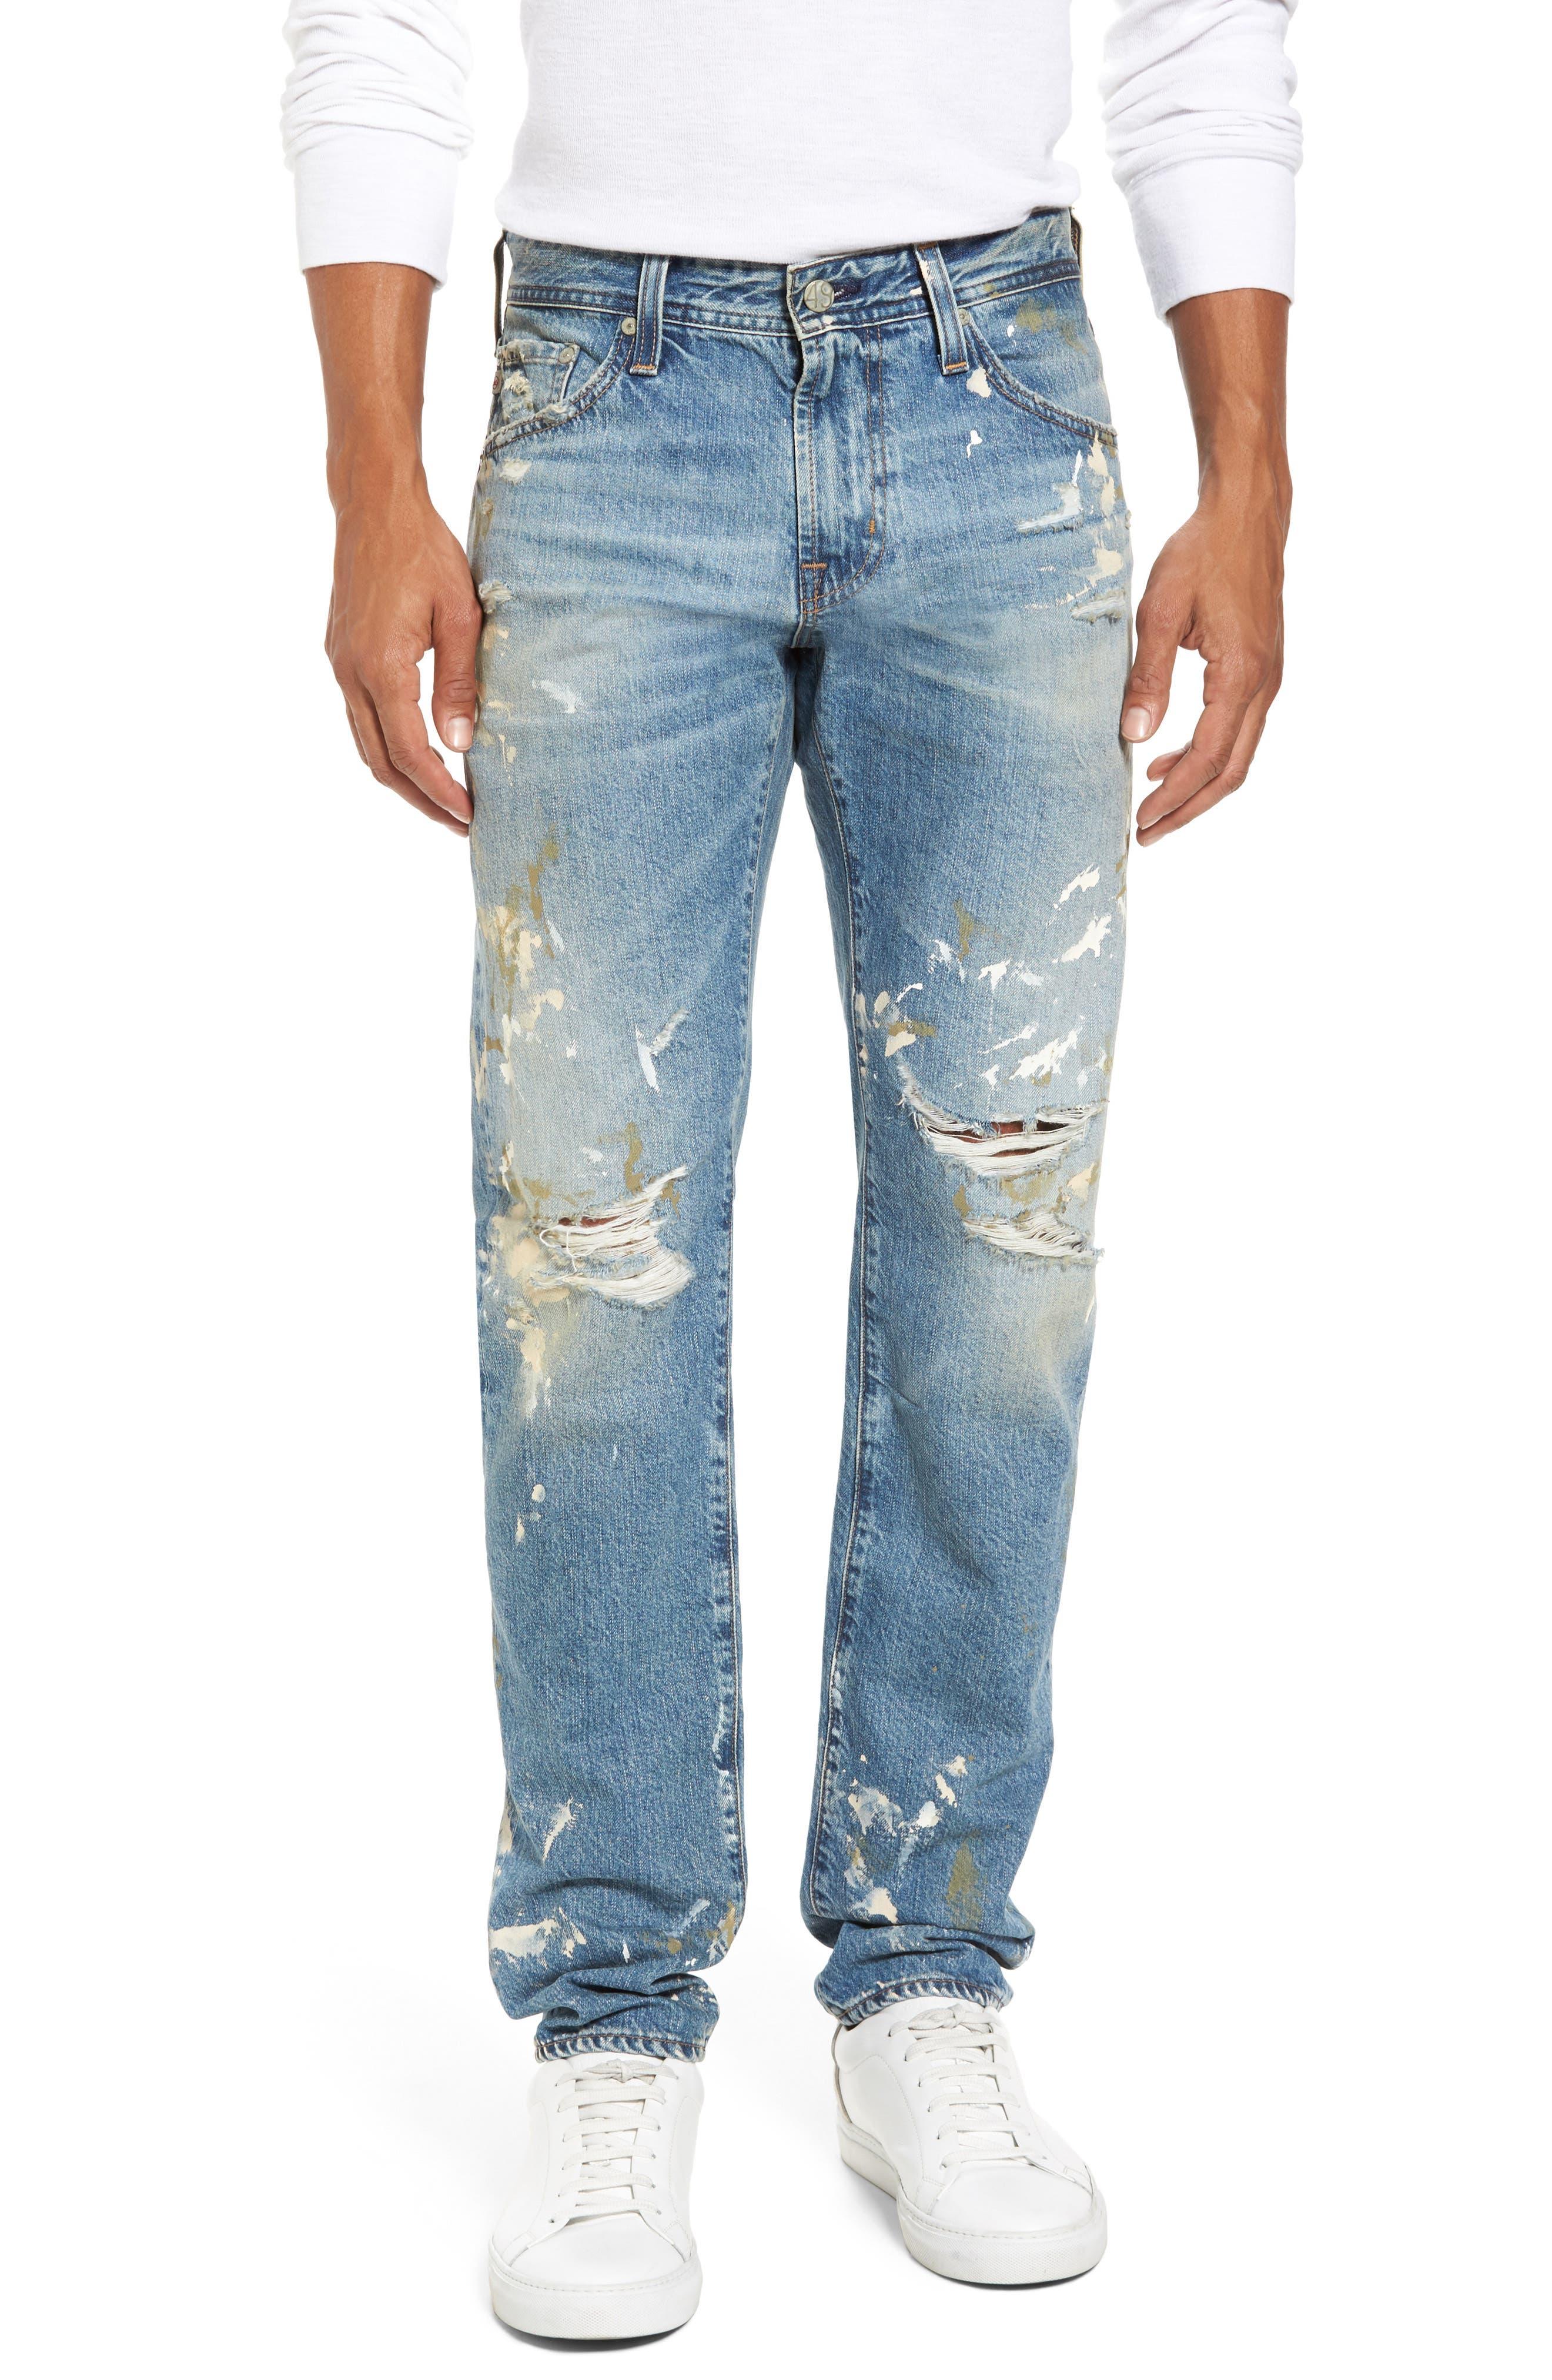 Tellis Modern Slim Fit Jeans,                         Main,                         color, 18 Years Carpenter